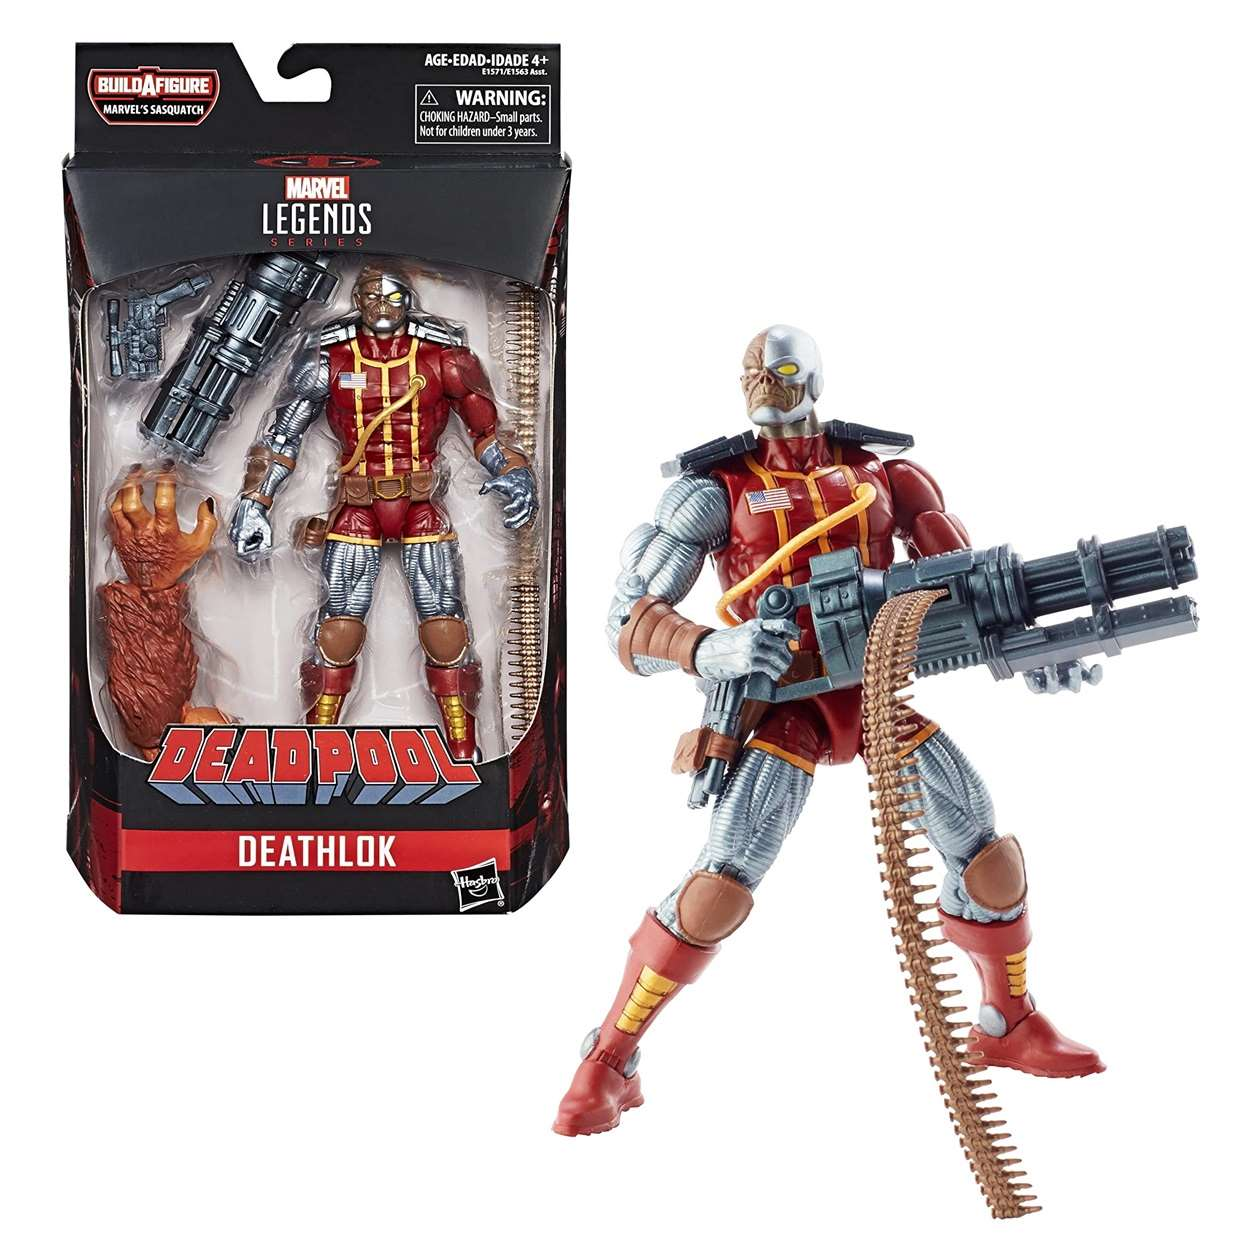 Deathlok Figura Marvel B A F Sasquatch Deadpool Legends  6 Pulg